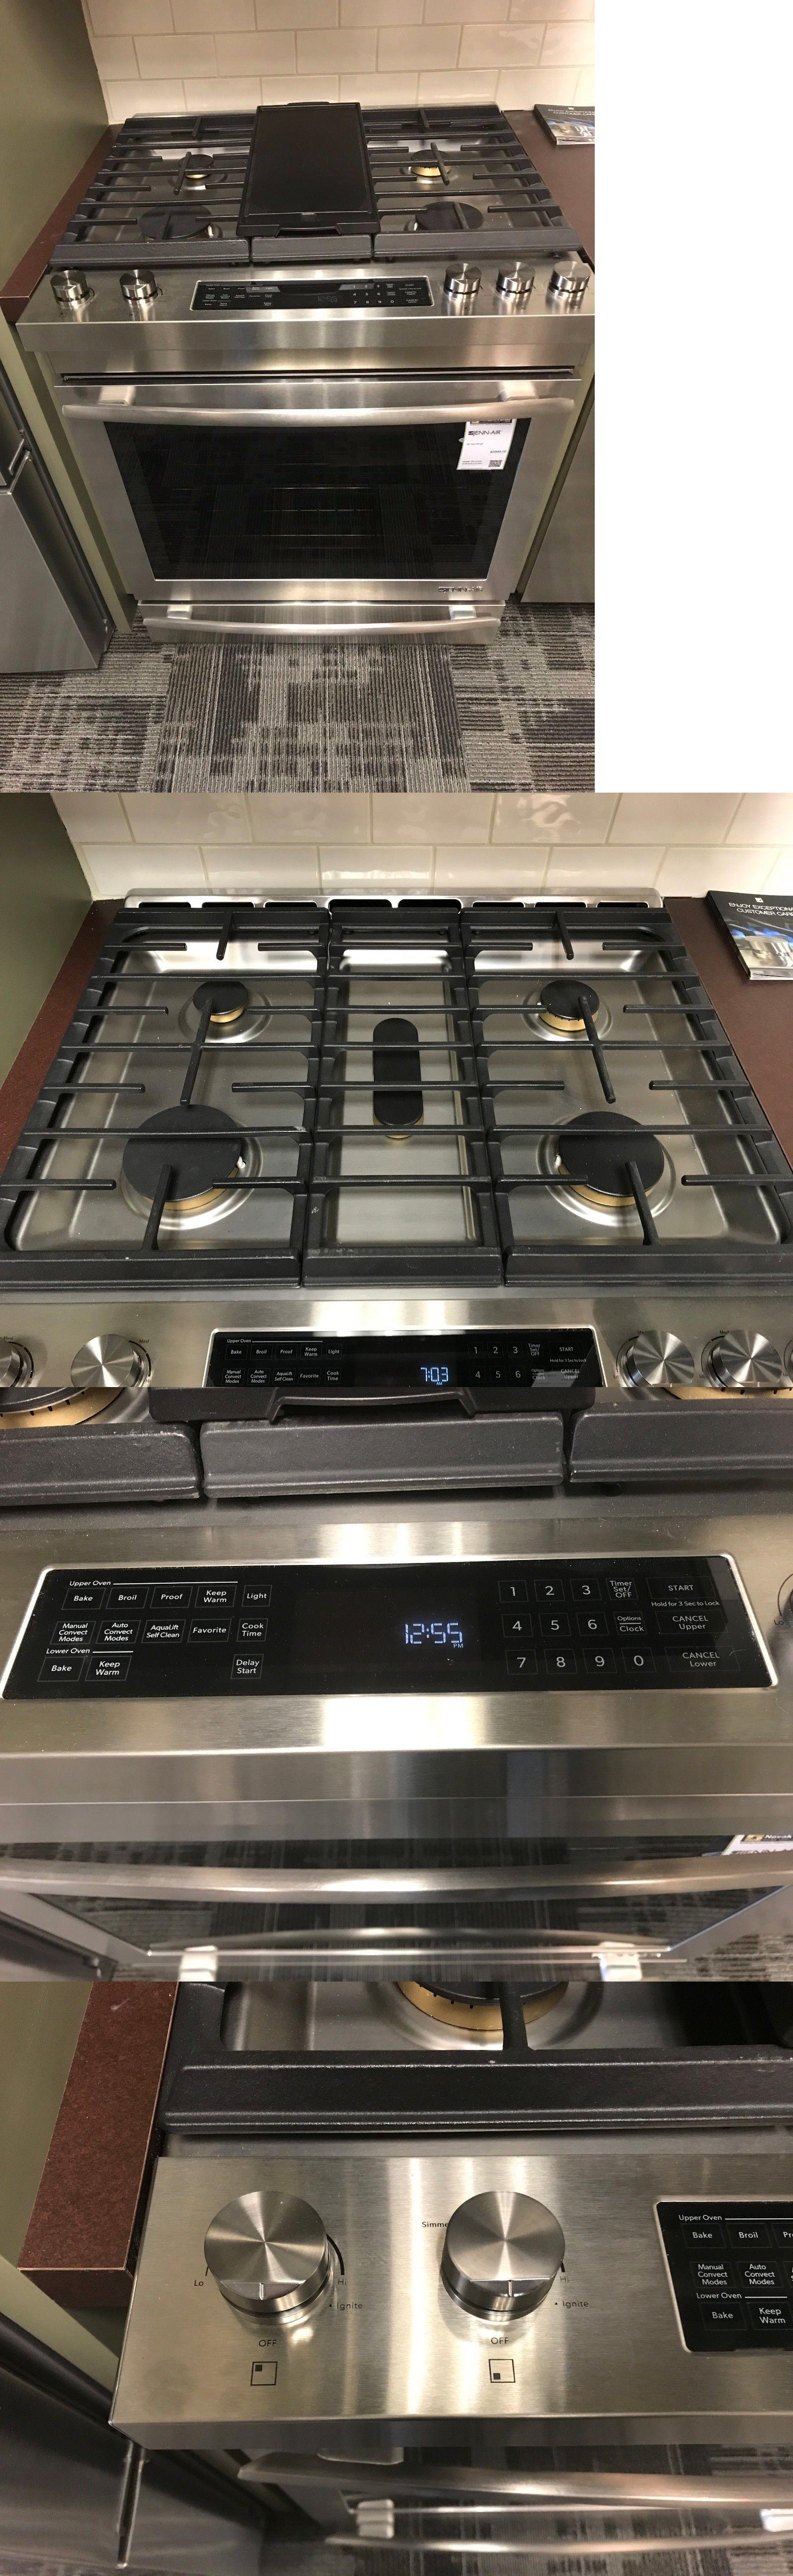 appliances jenn air jgs1450ds 30 stainless steel slide in gas